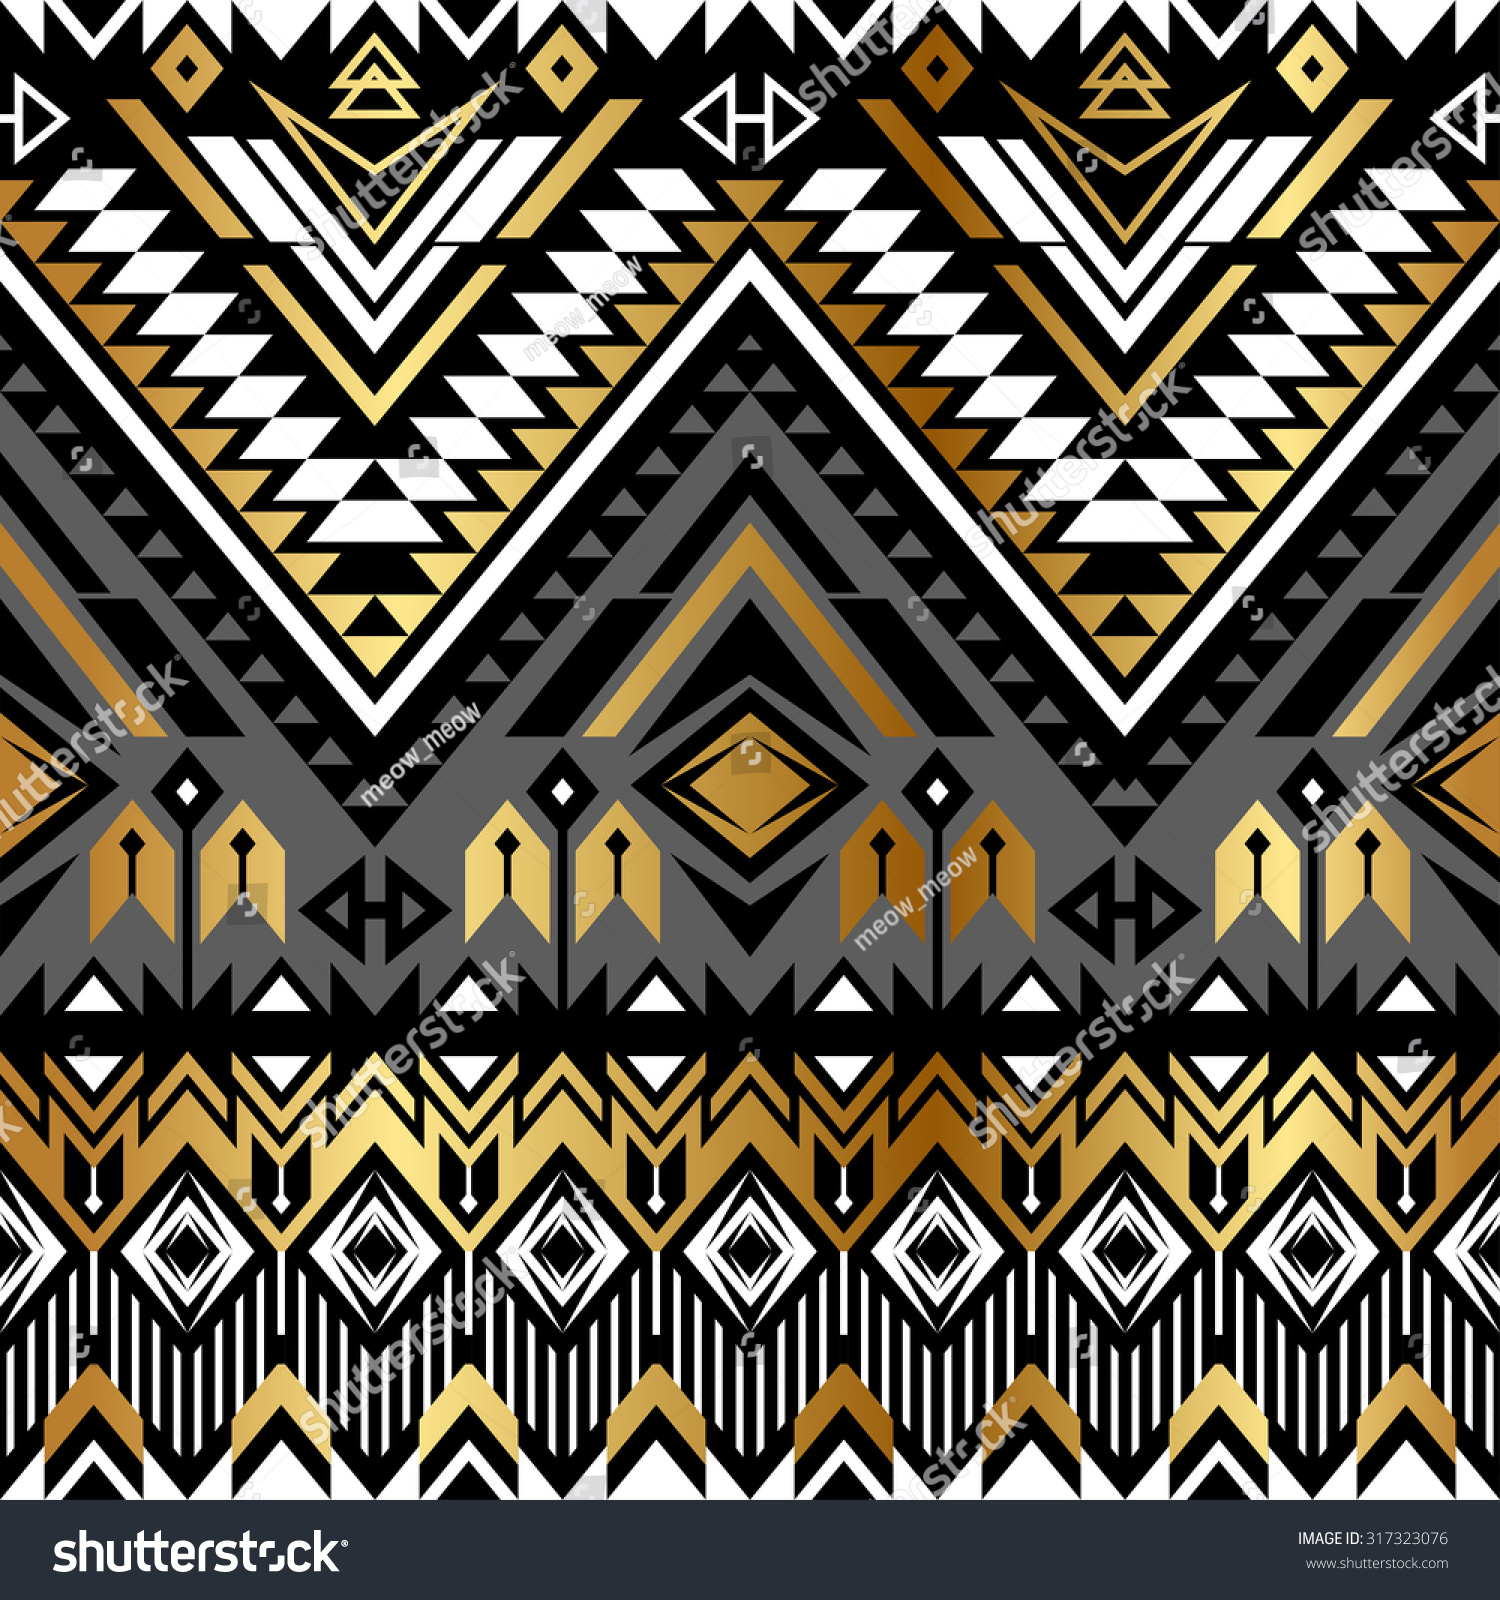 Tribal Navajo Ornamental Seamless Pattern Aztec Abstract Geometric Print Ethnic Hipster Backdrop It